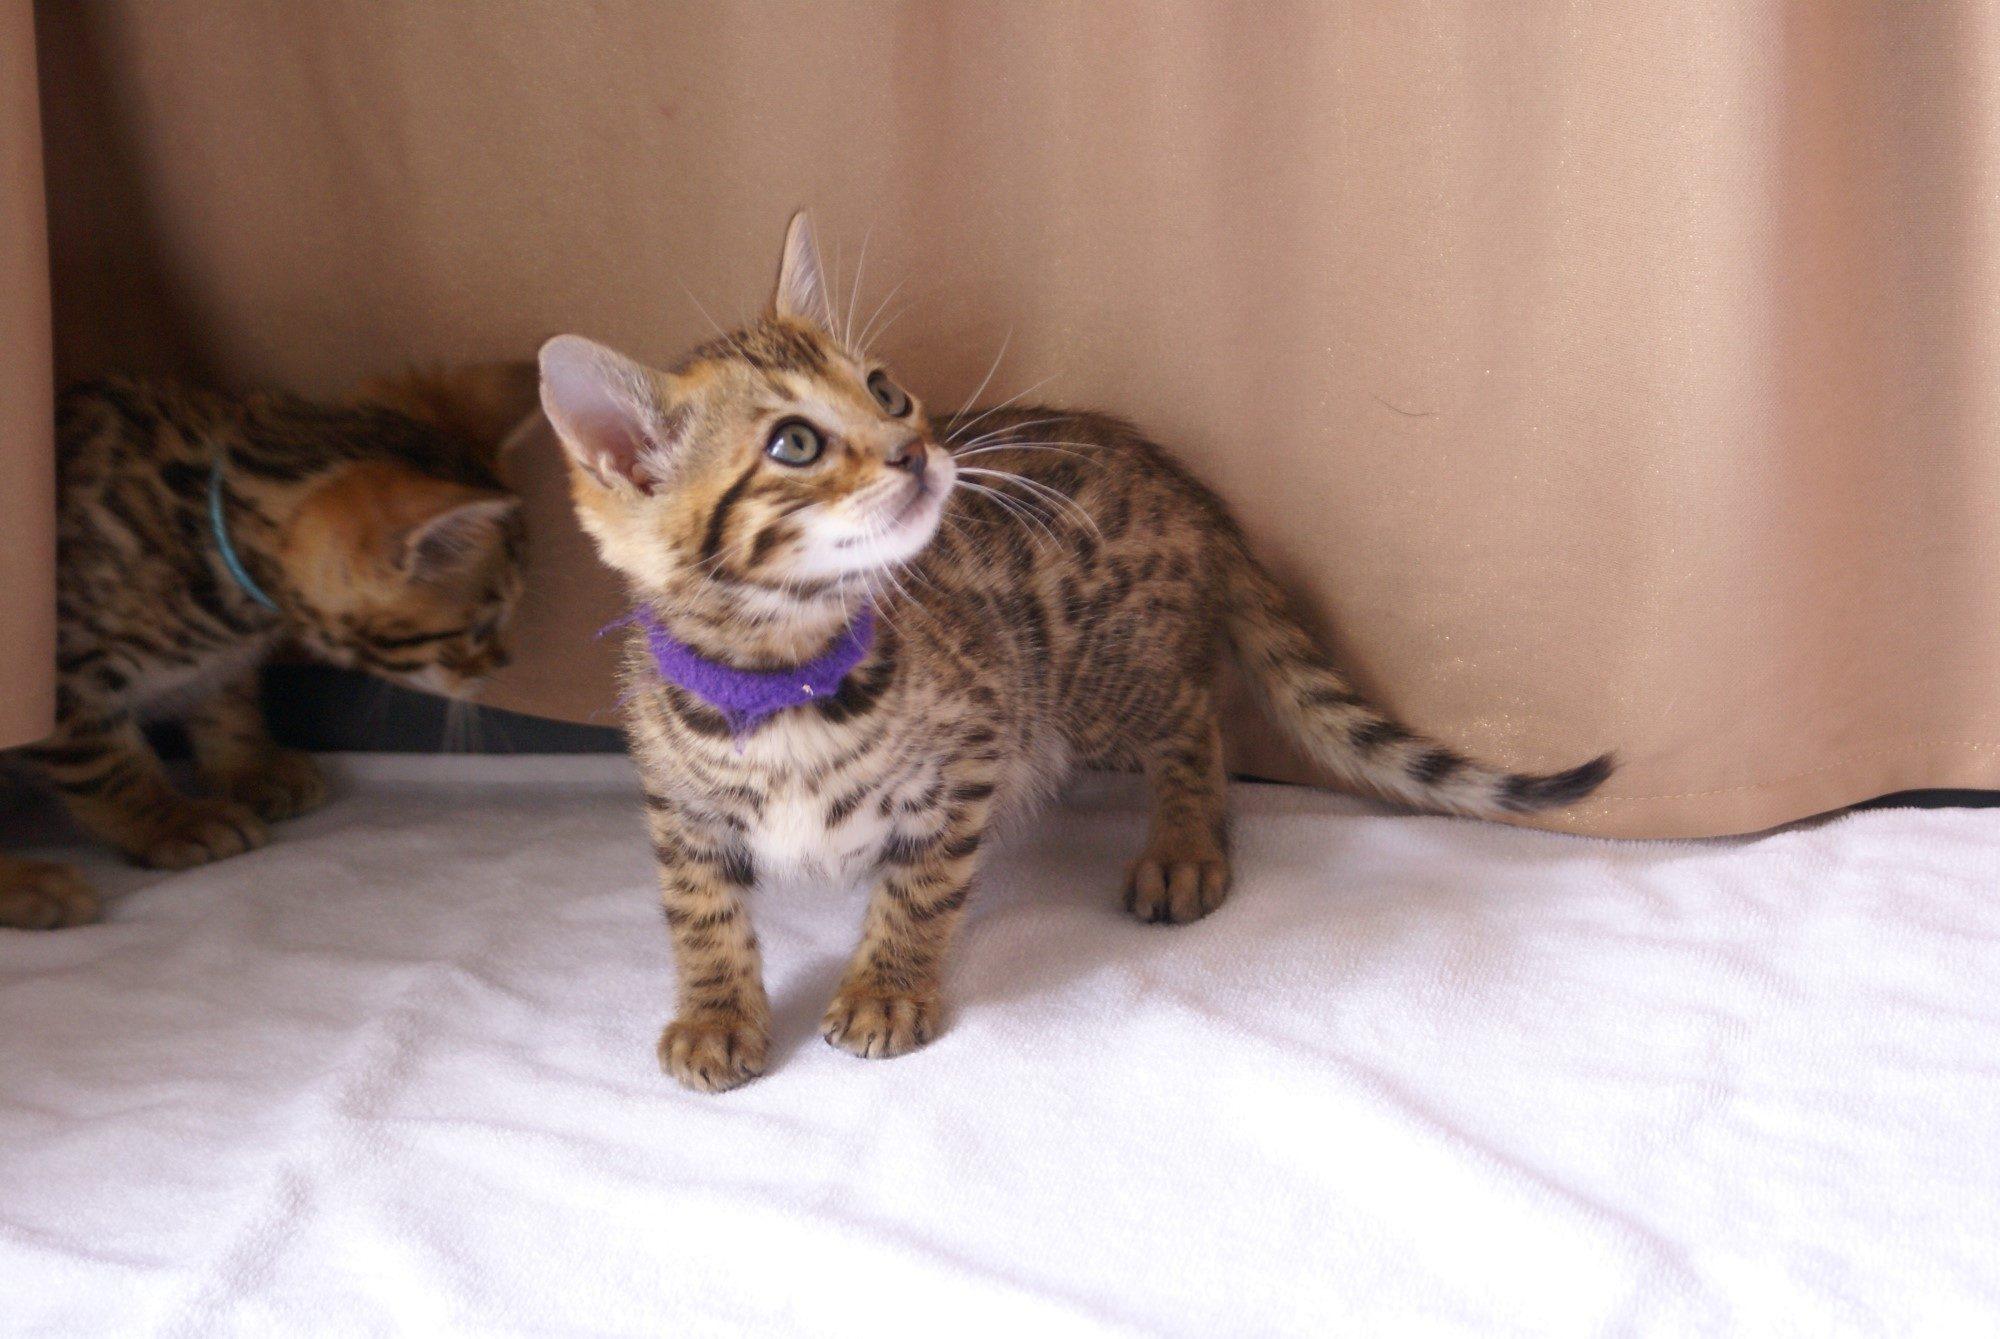 Photo 2 of Kovu the Bengal kitten.